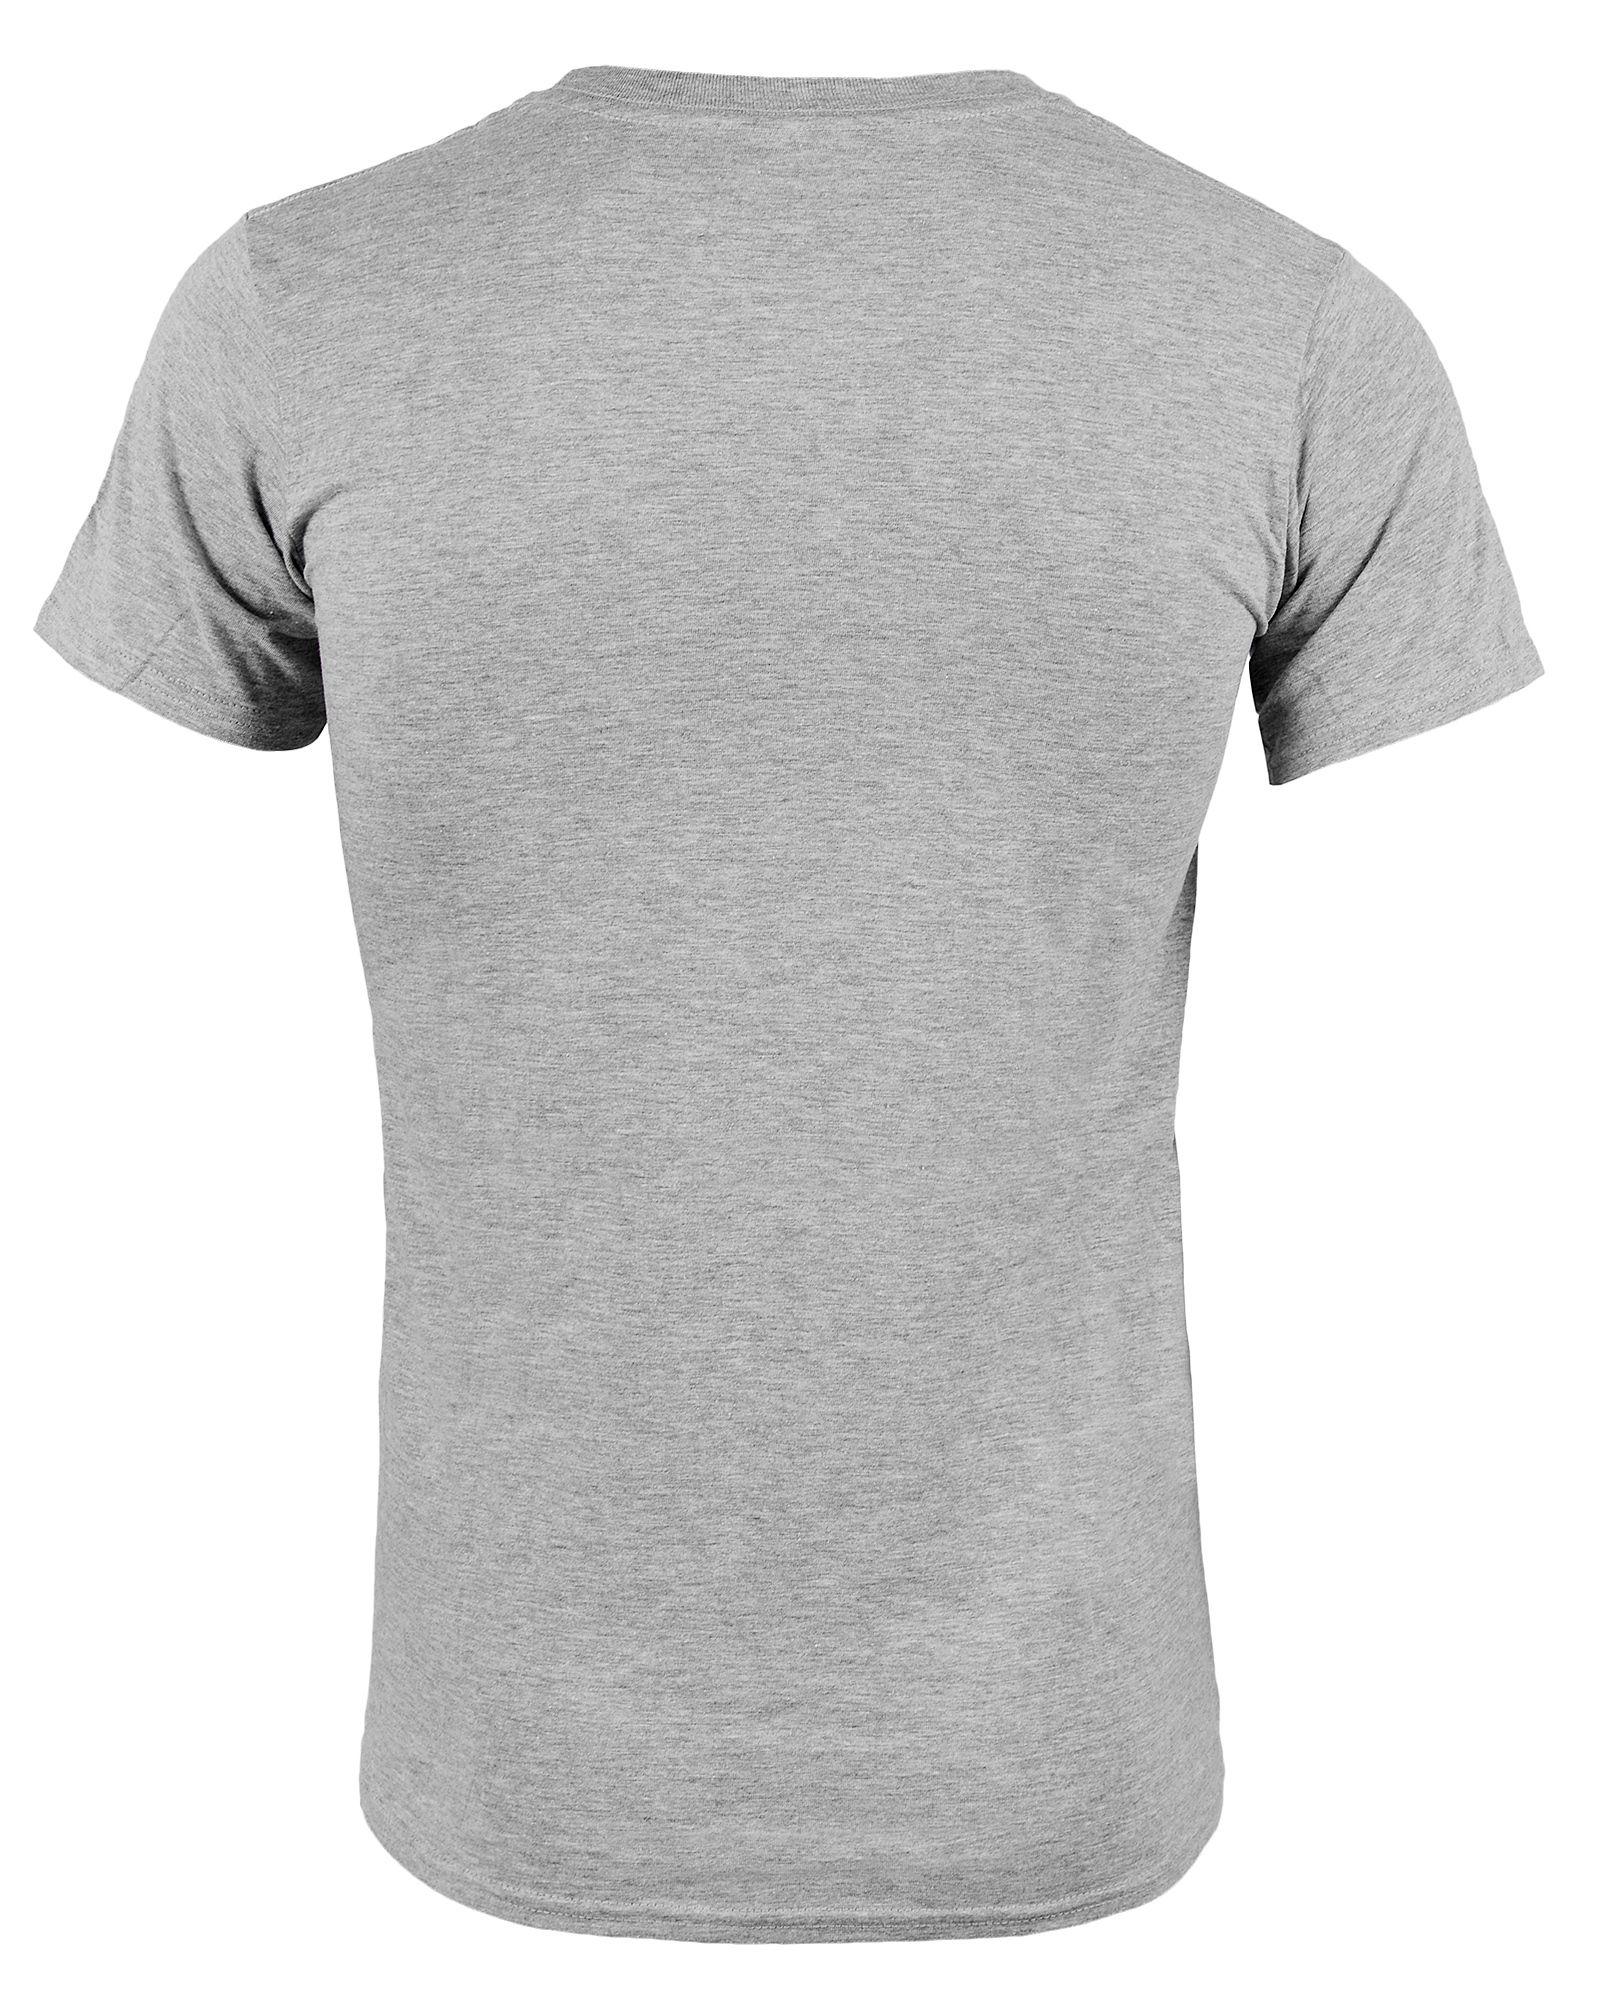 Тениска Micky Mouse - Tap, сива, размер XL - 2